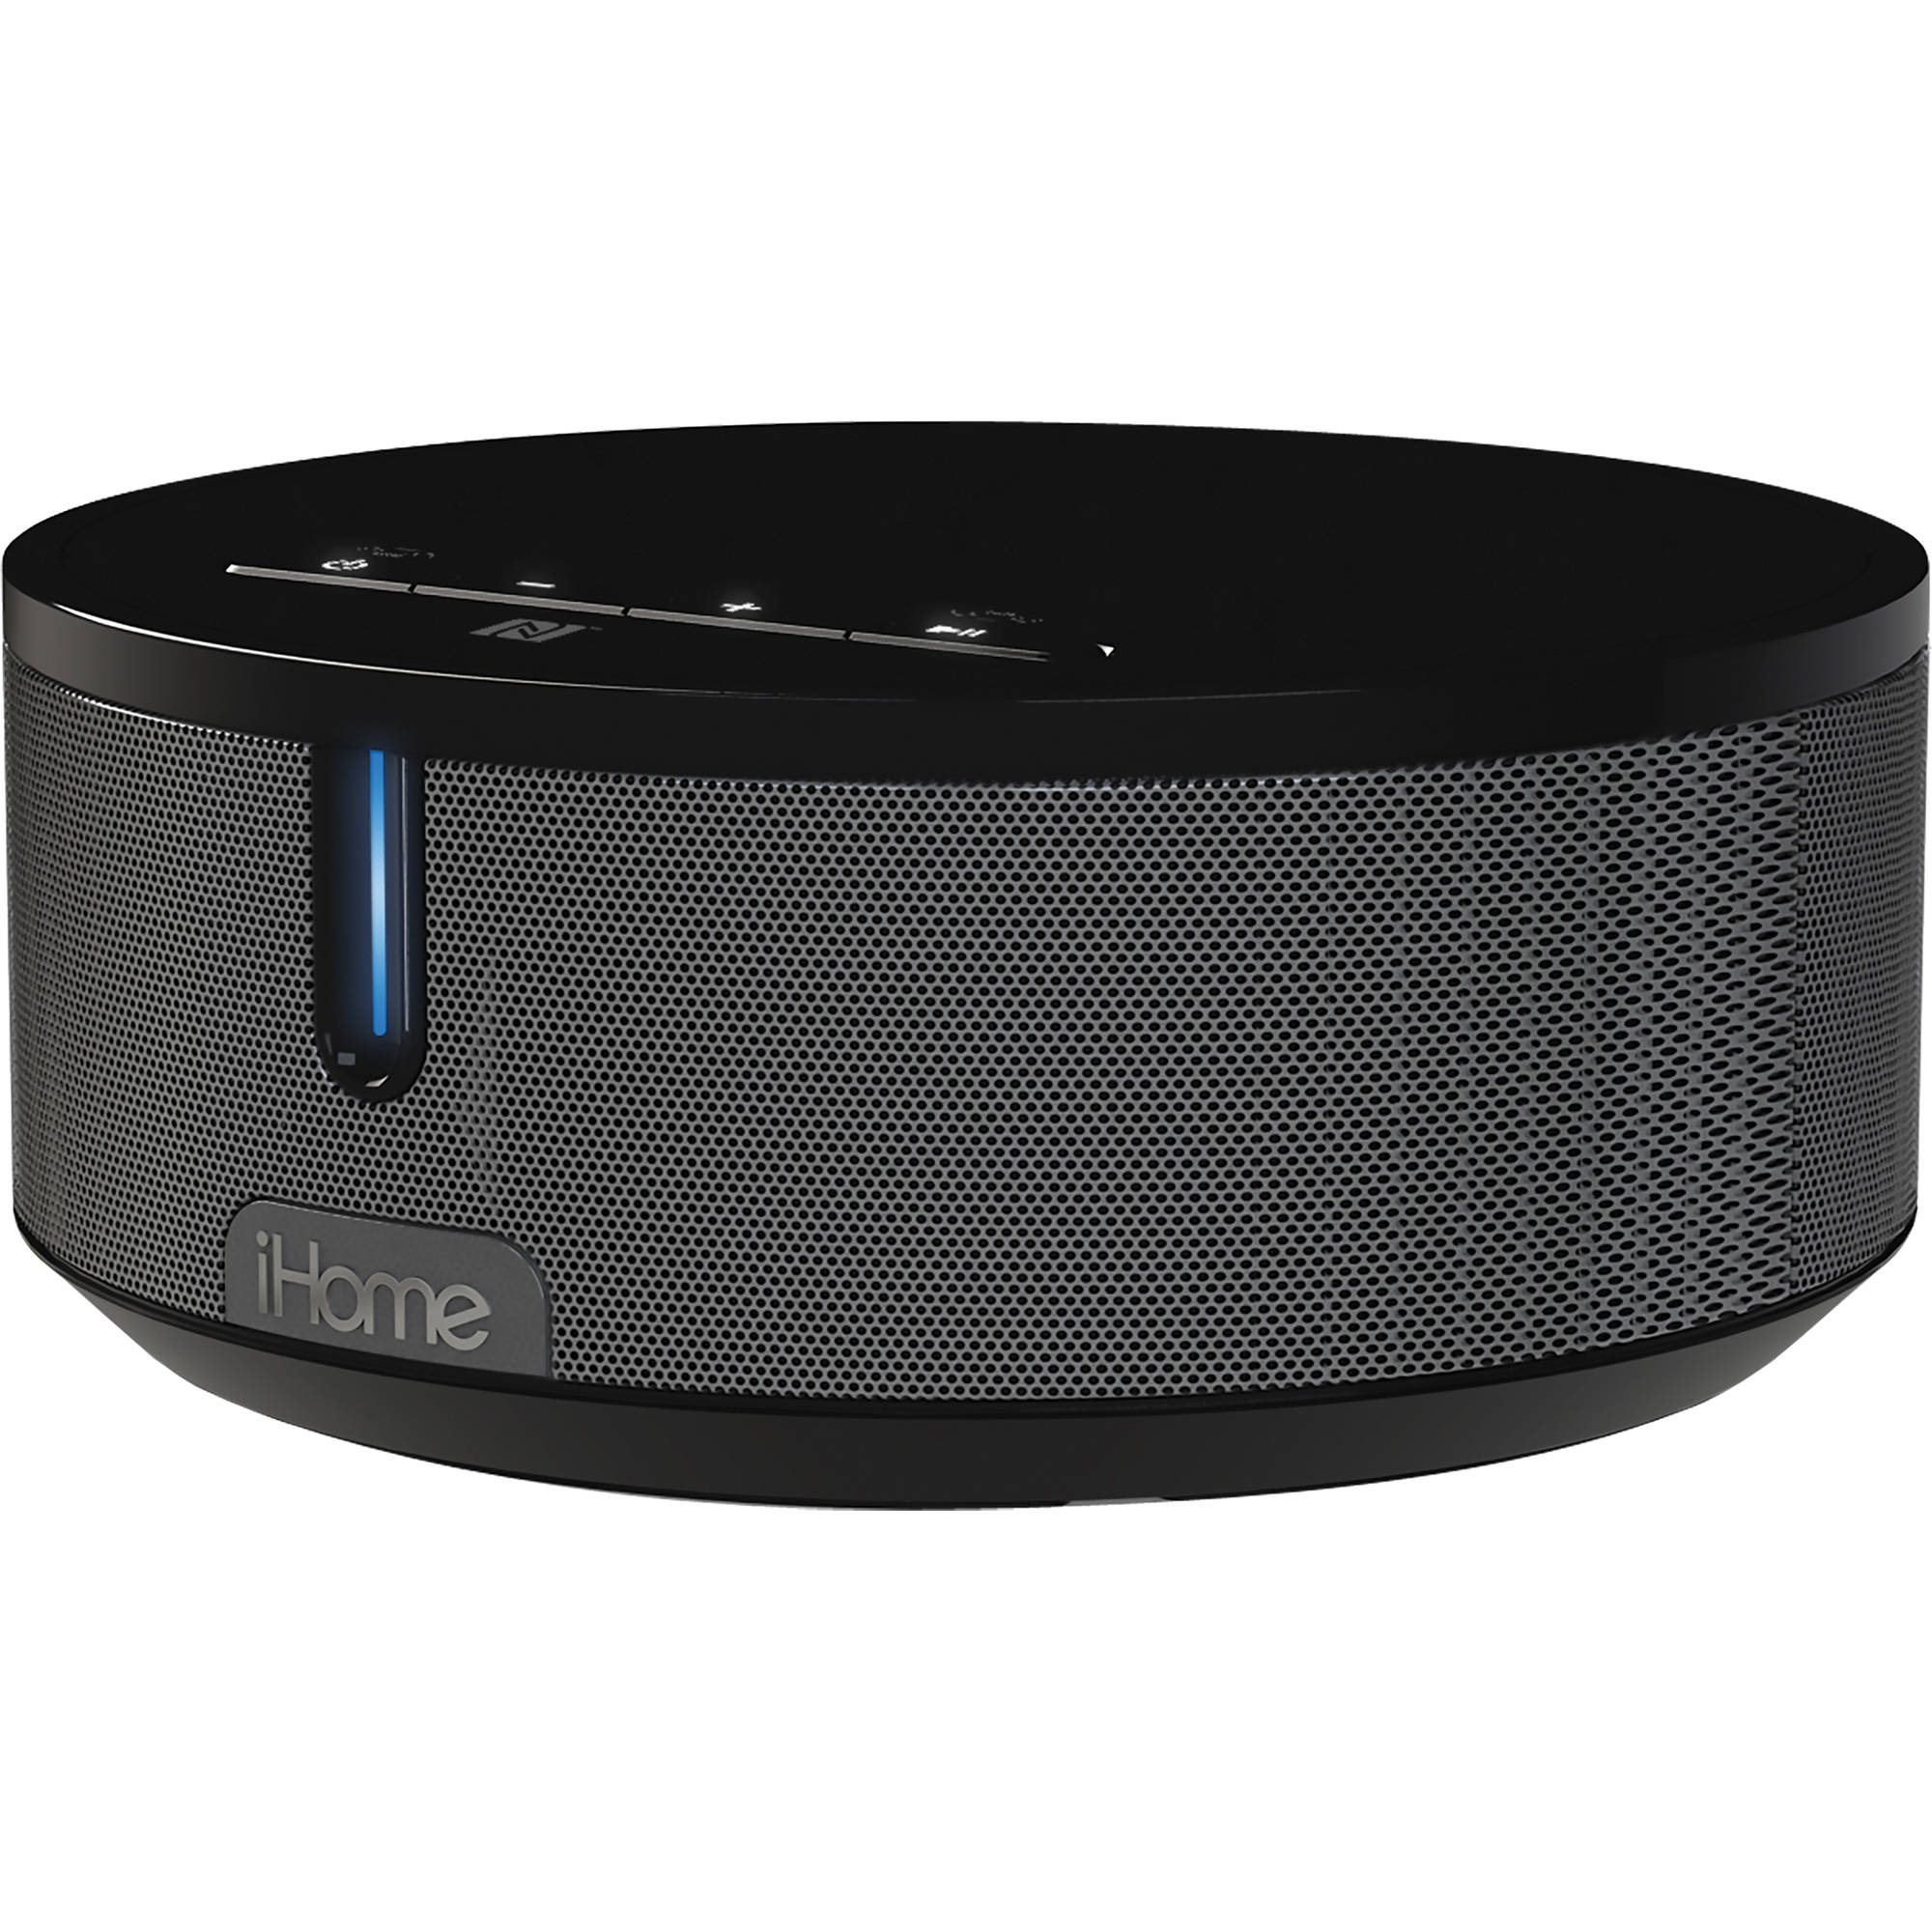 IHome IBN26 Bluetooth Stereo Speaker System (Black) IBN26GC B&H